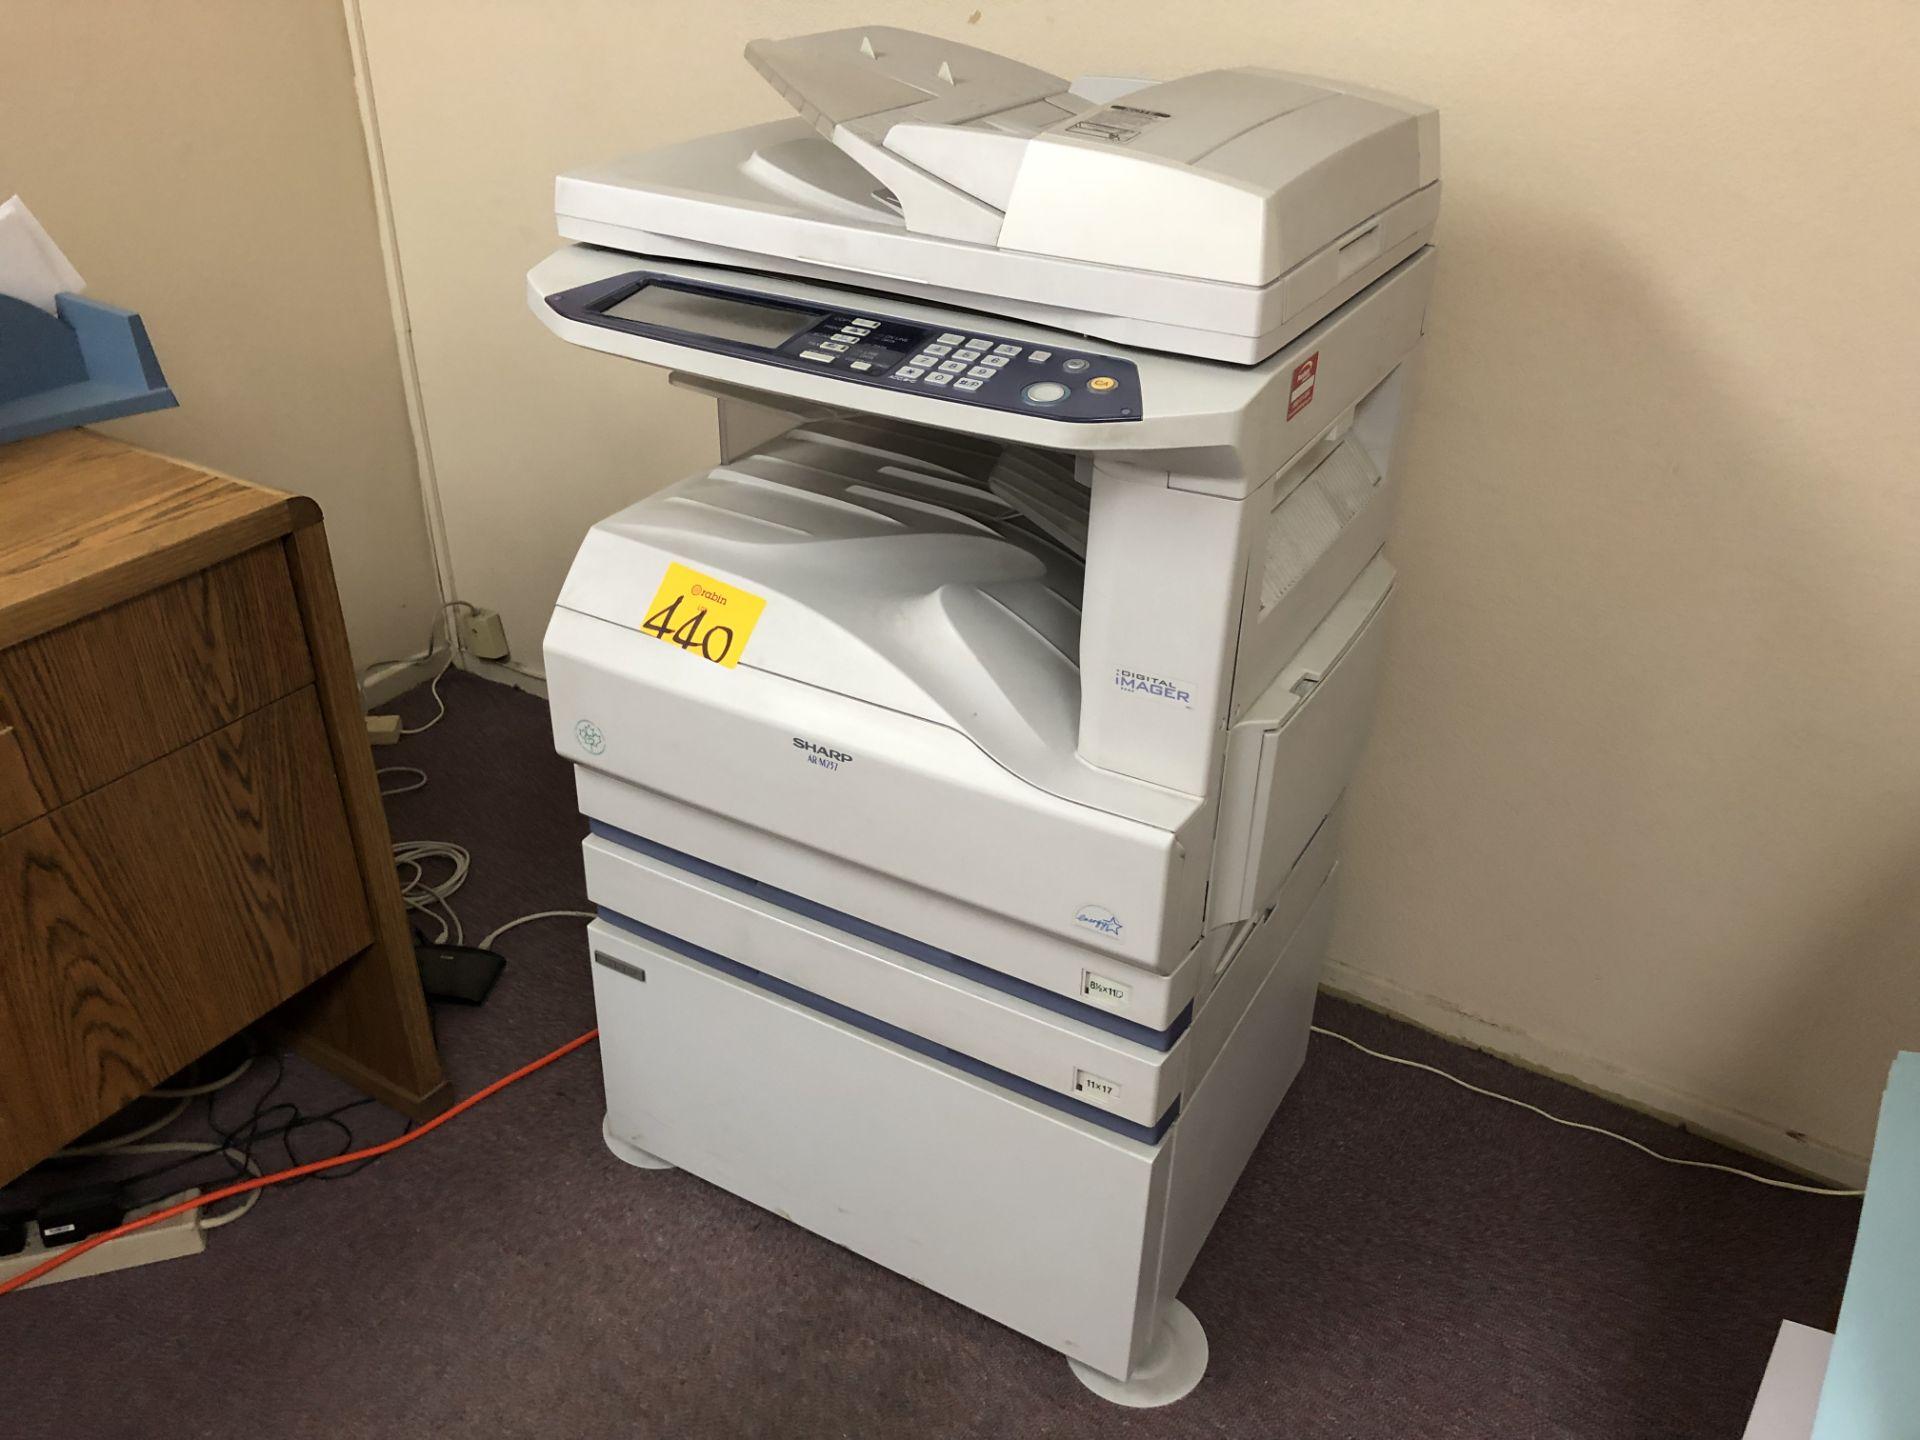 Lot 440 - Printer/Copier